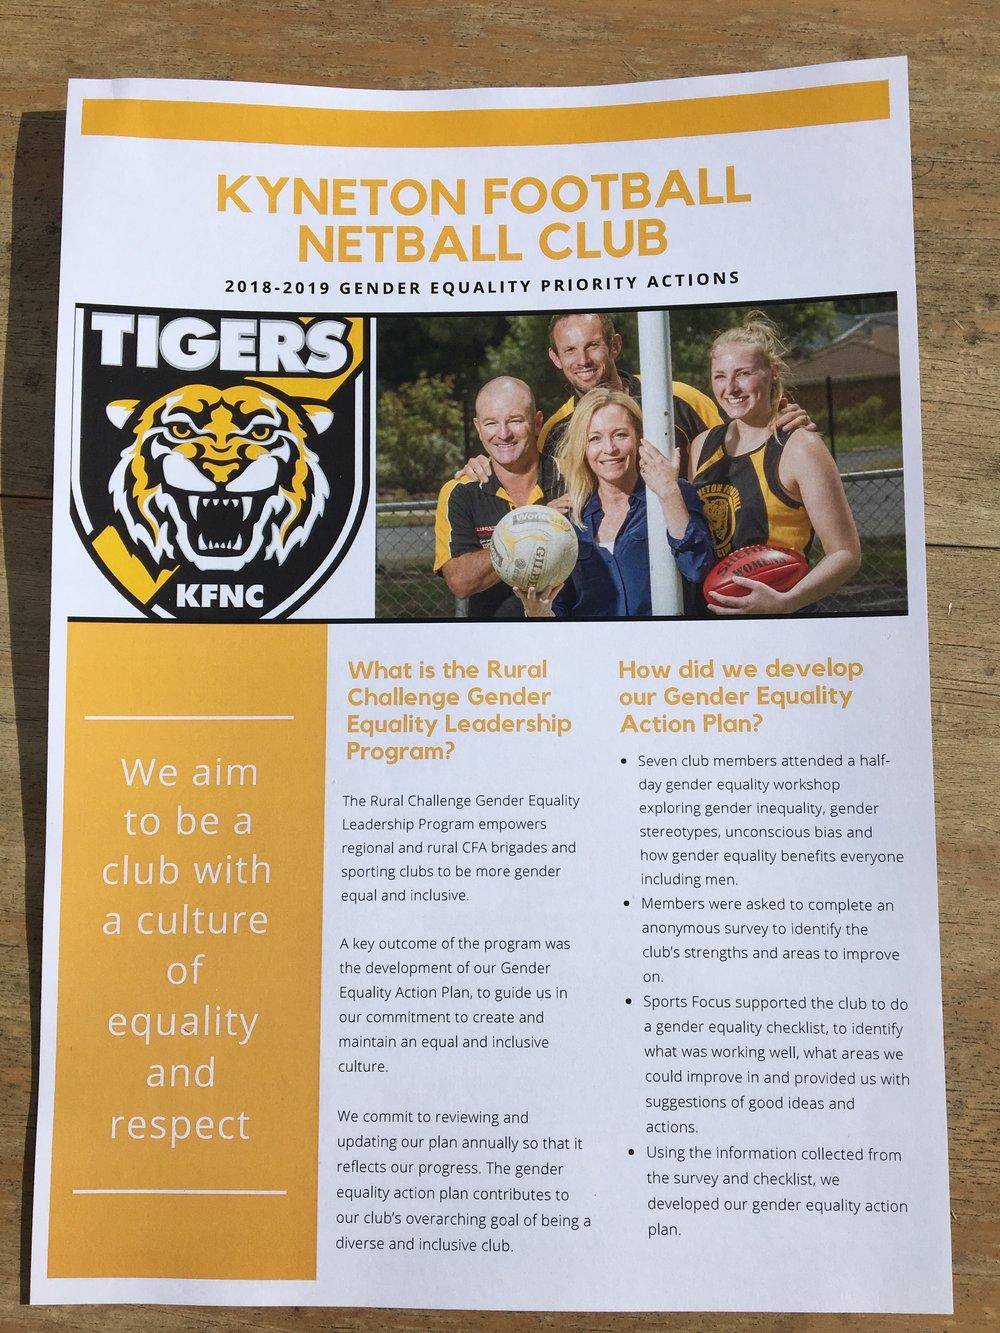 Kyneton Football Netball Club's Gender Equality Action Plan Goal